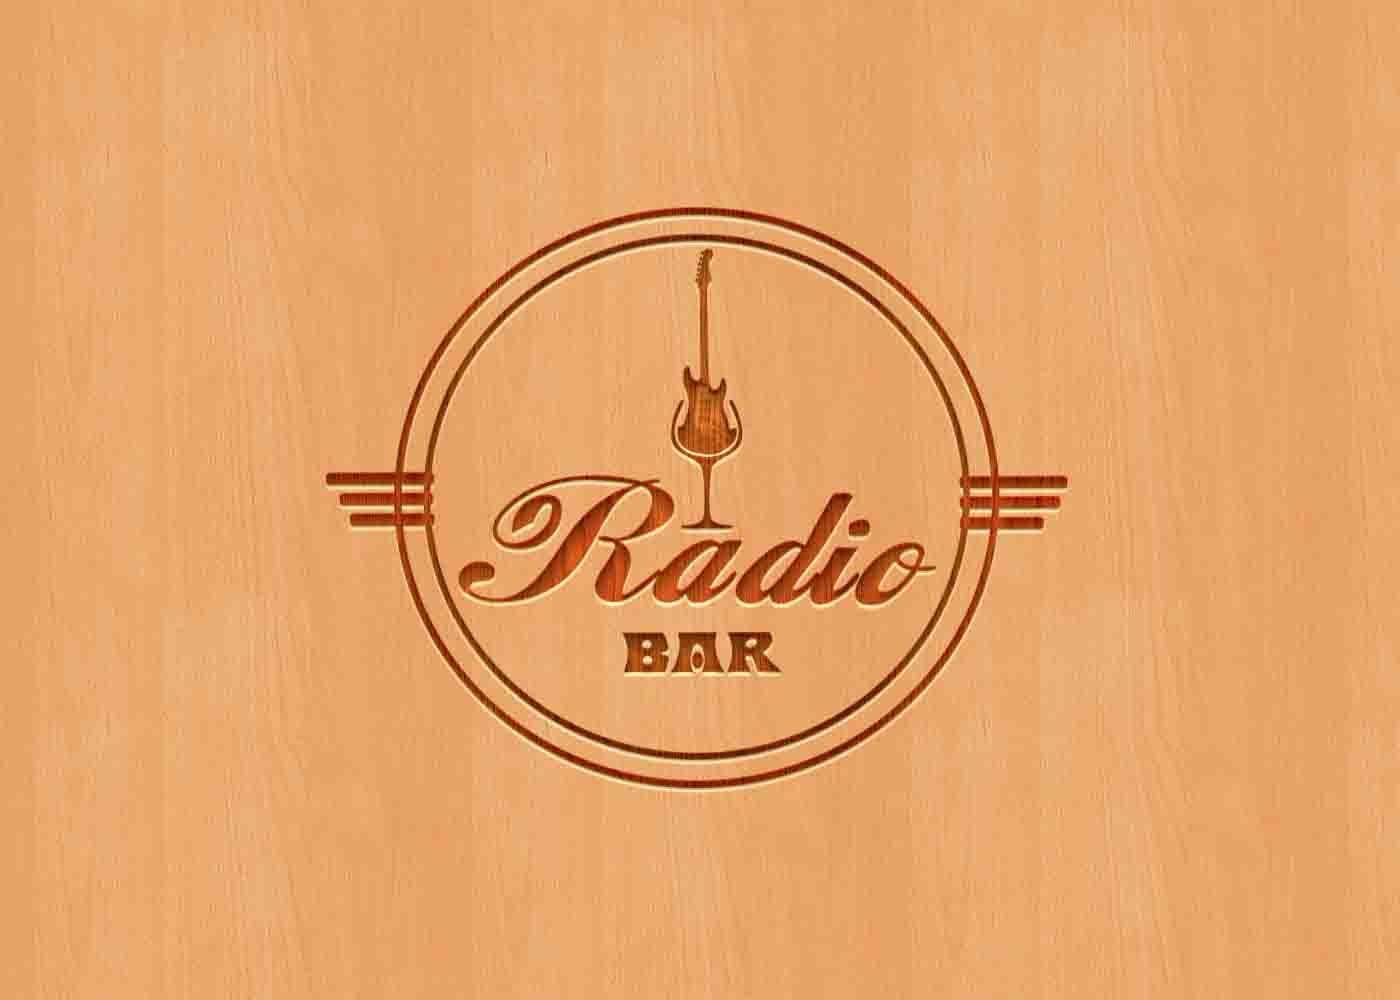 Логотип для Radio bar - дизайнер Rusalam